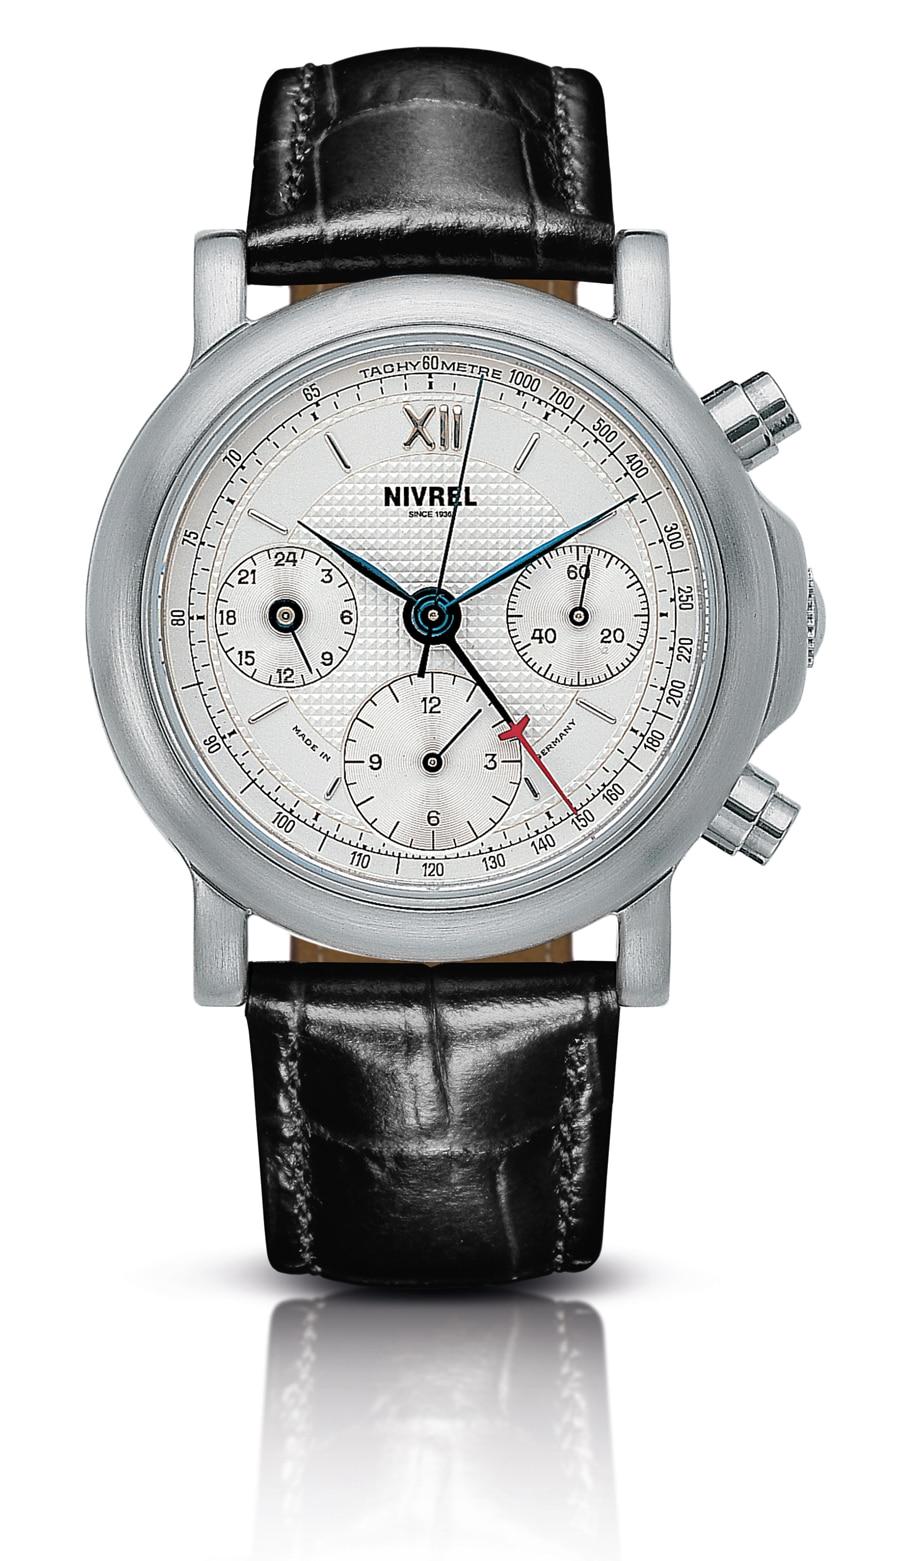 Nivrel: Heritage Chronographe Minutes